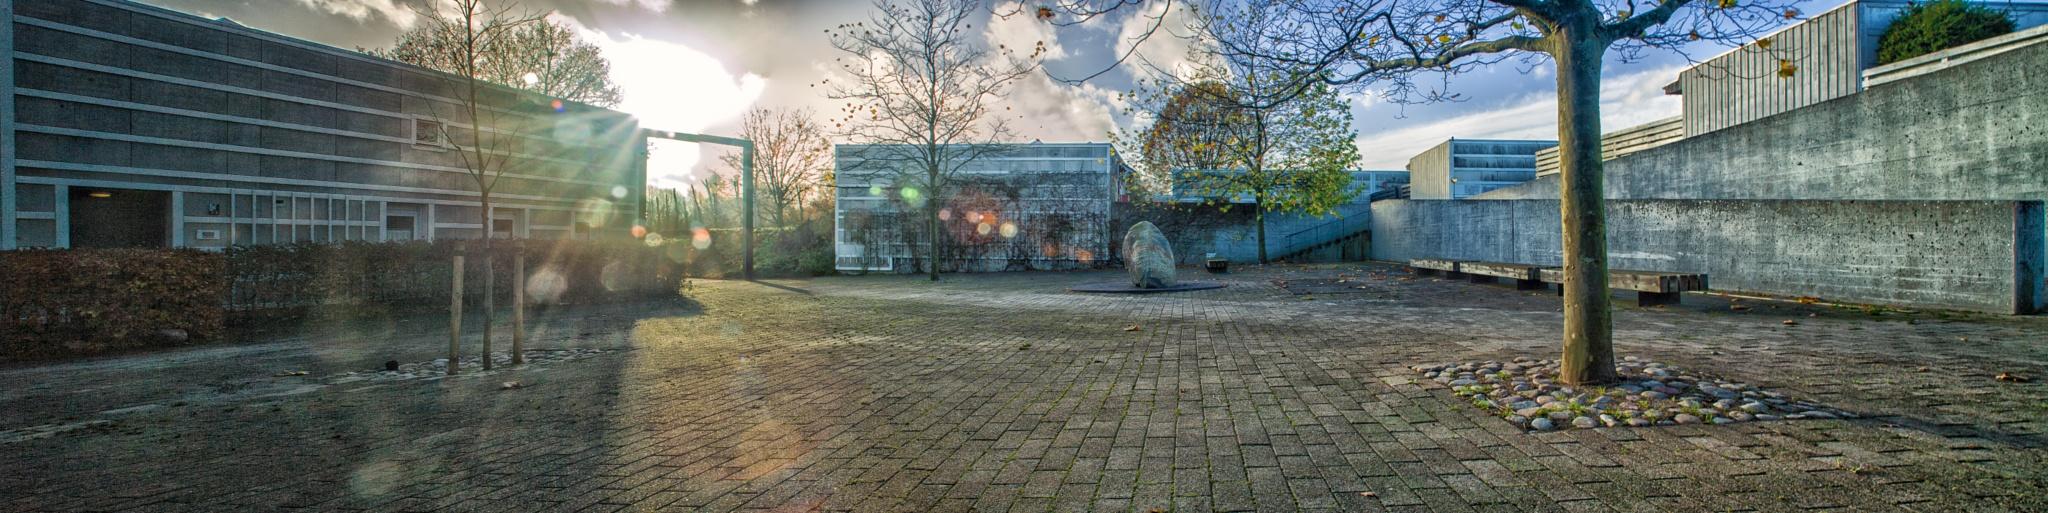 Brogaards Plads in Albertslund by weaksyntax